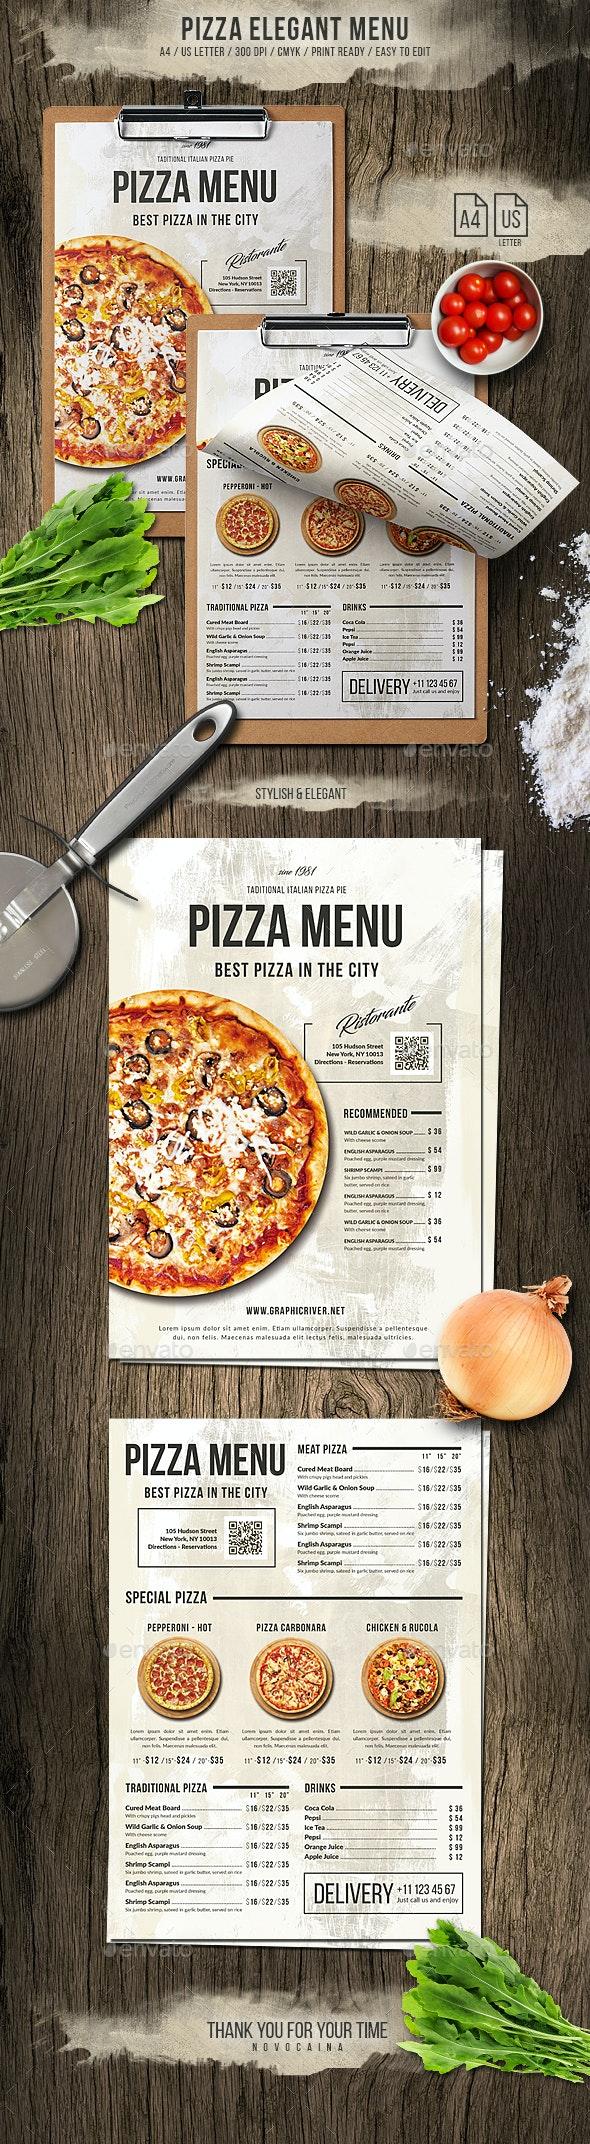 Pizza Elegant Menu - A4 and US Letter - Food Menus Print Templates